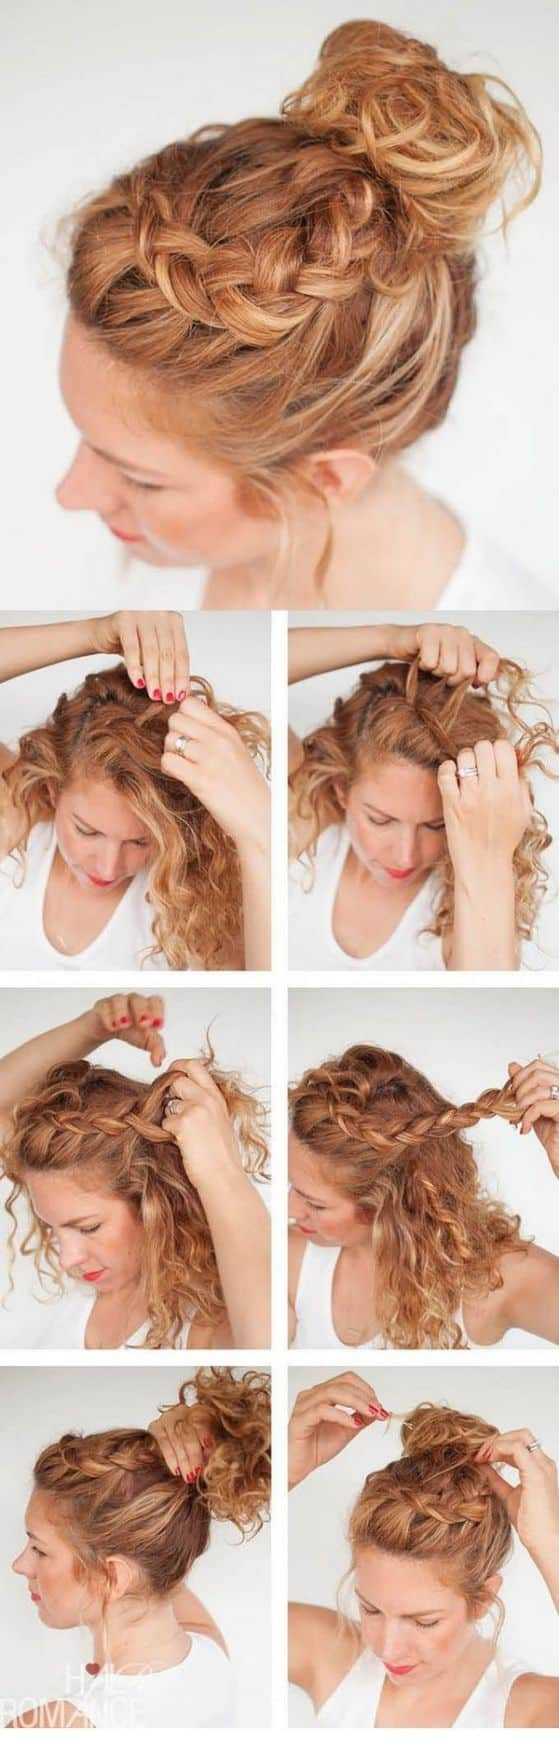 Tipos de peinados diarios para mujeres